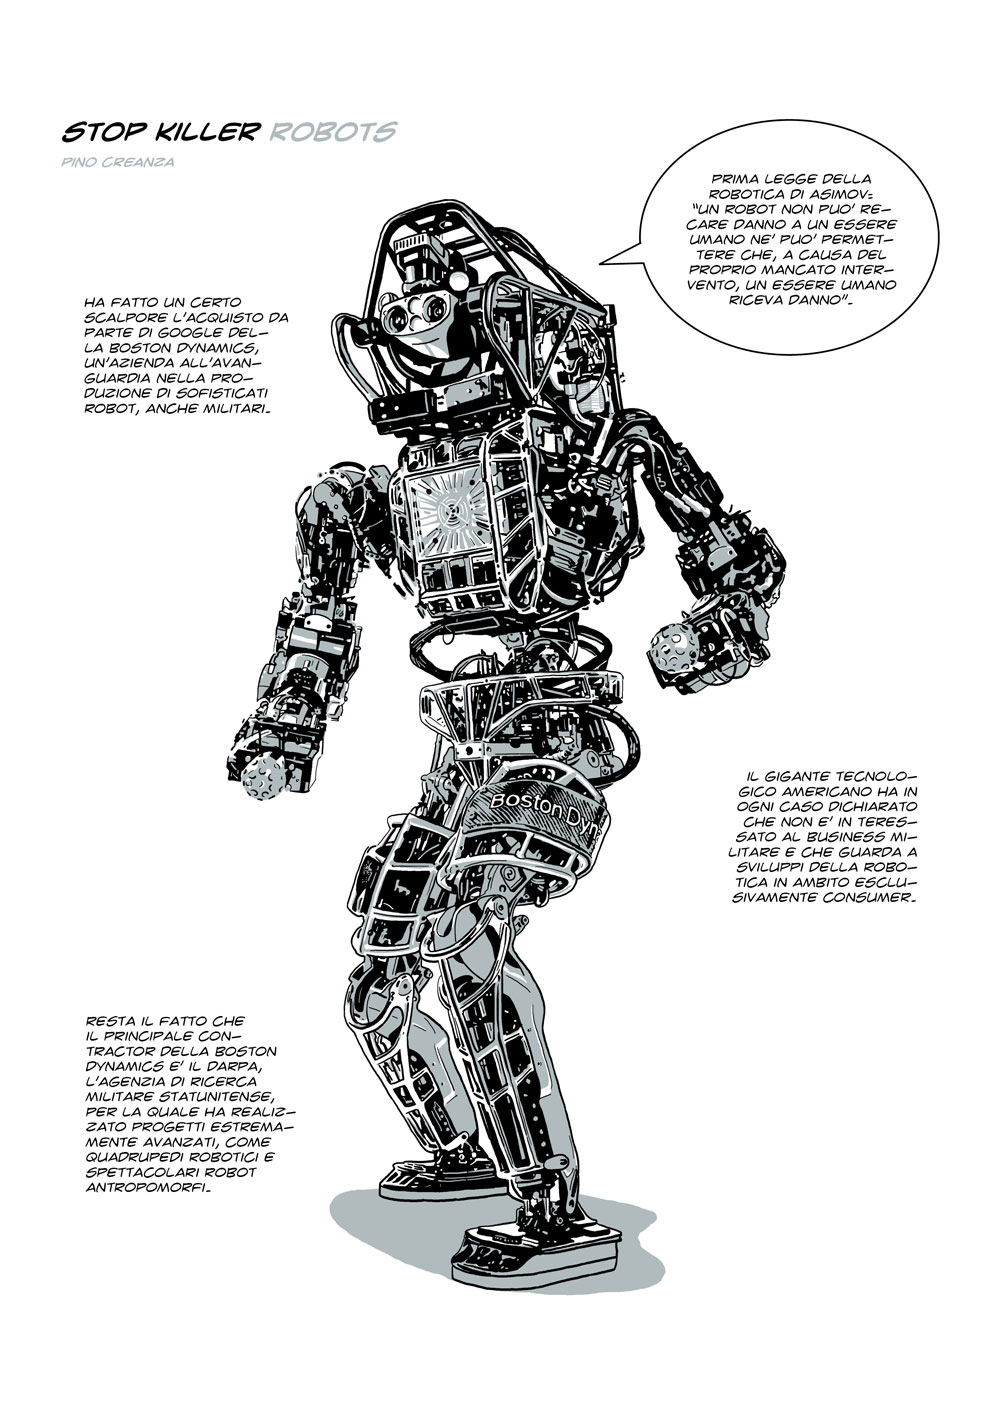 stop_killer_robots_east53-1.jpg